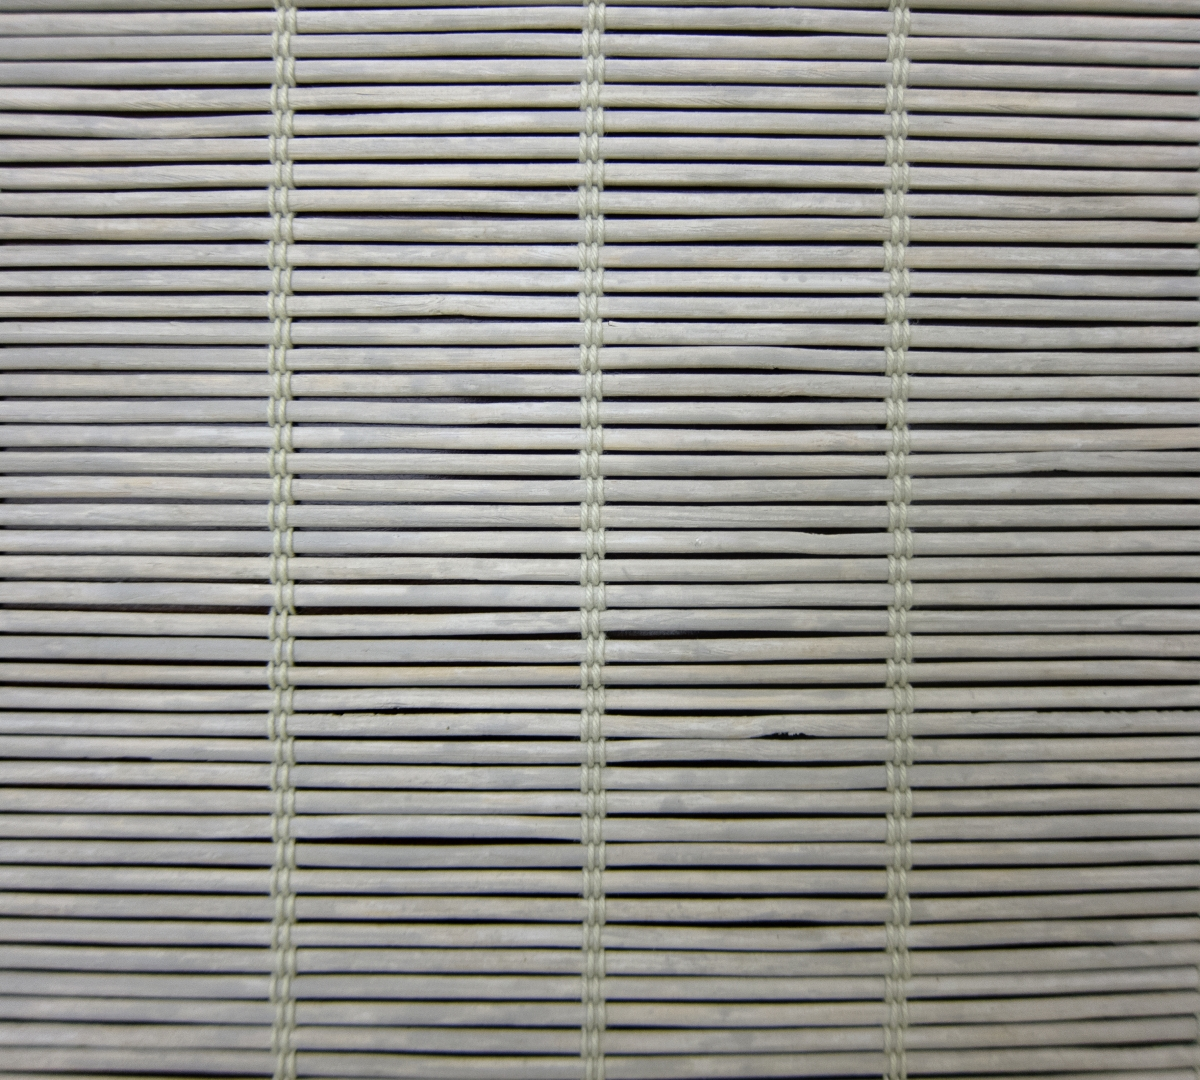 Bayhead-Grey Tint